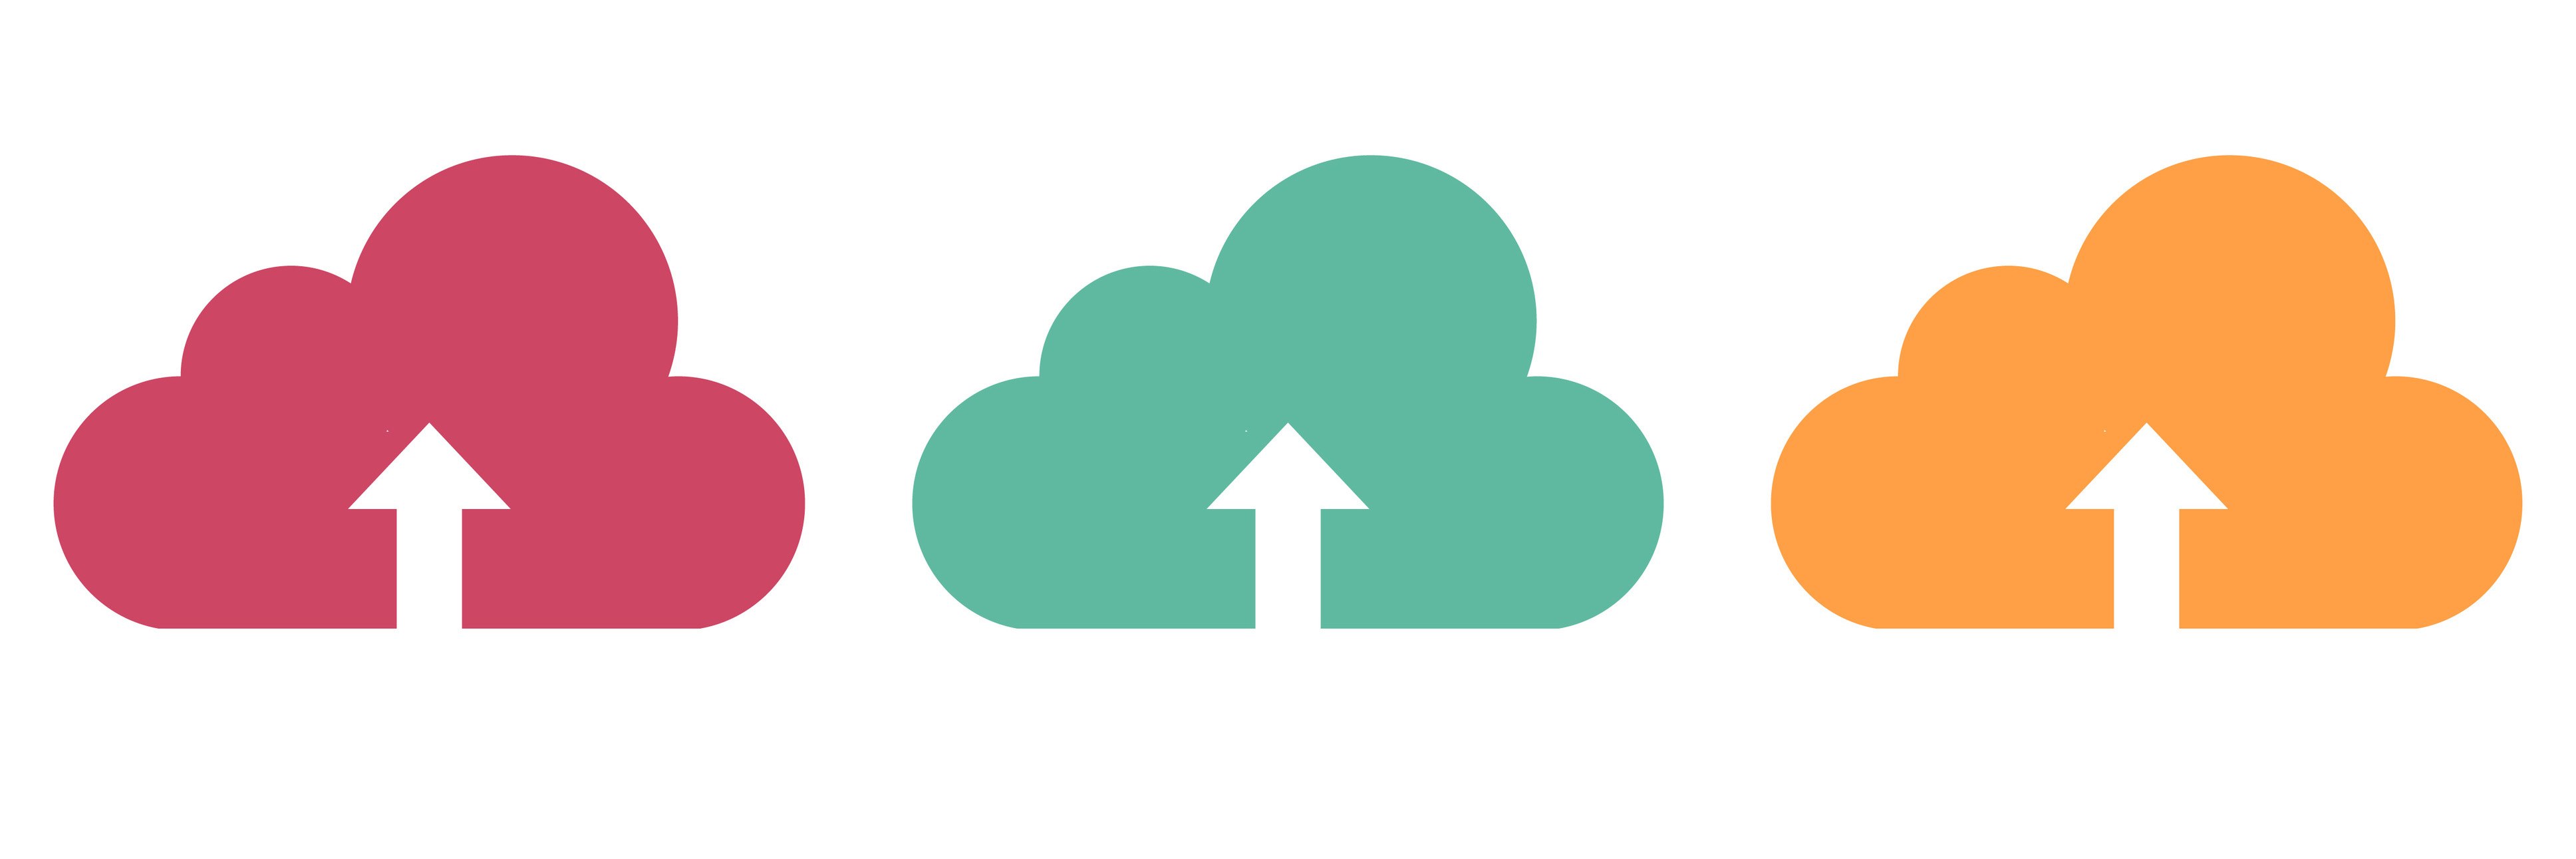 Saudi Arabia could warm to cloud computing, so long as regulation.